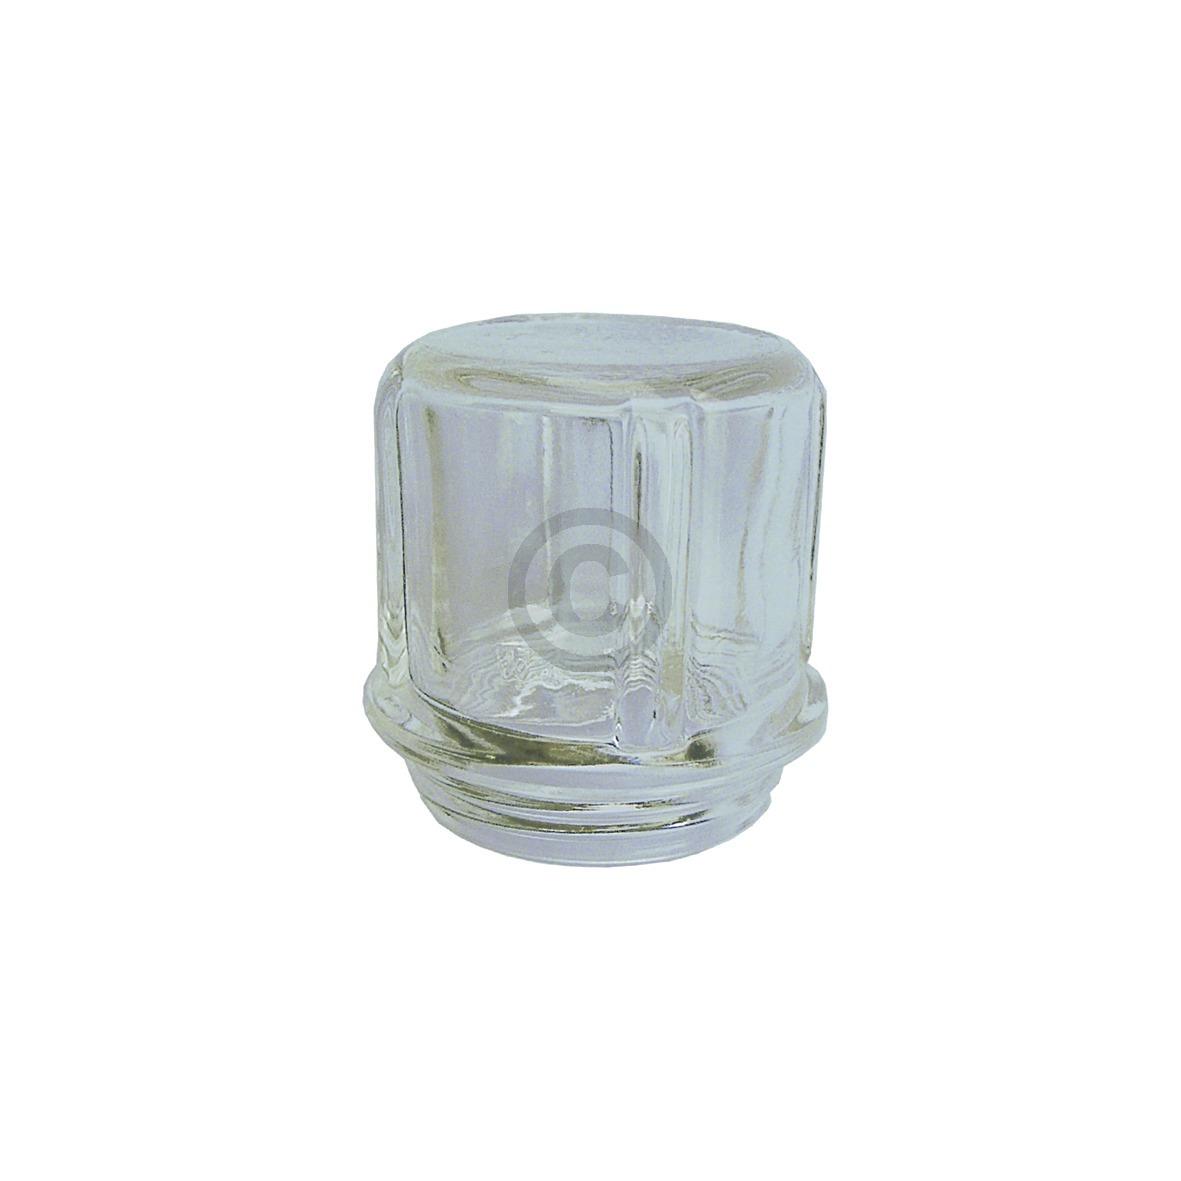 Lampenabdeckung Ø52mm, Glas 319256008 AEG, Electrolux, Juno, Zanussi